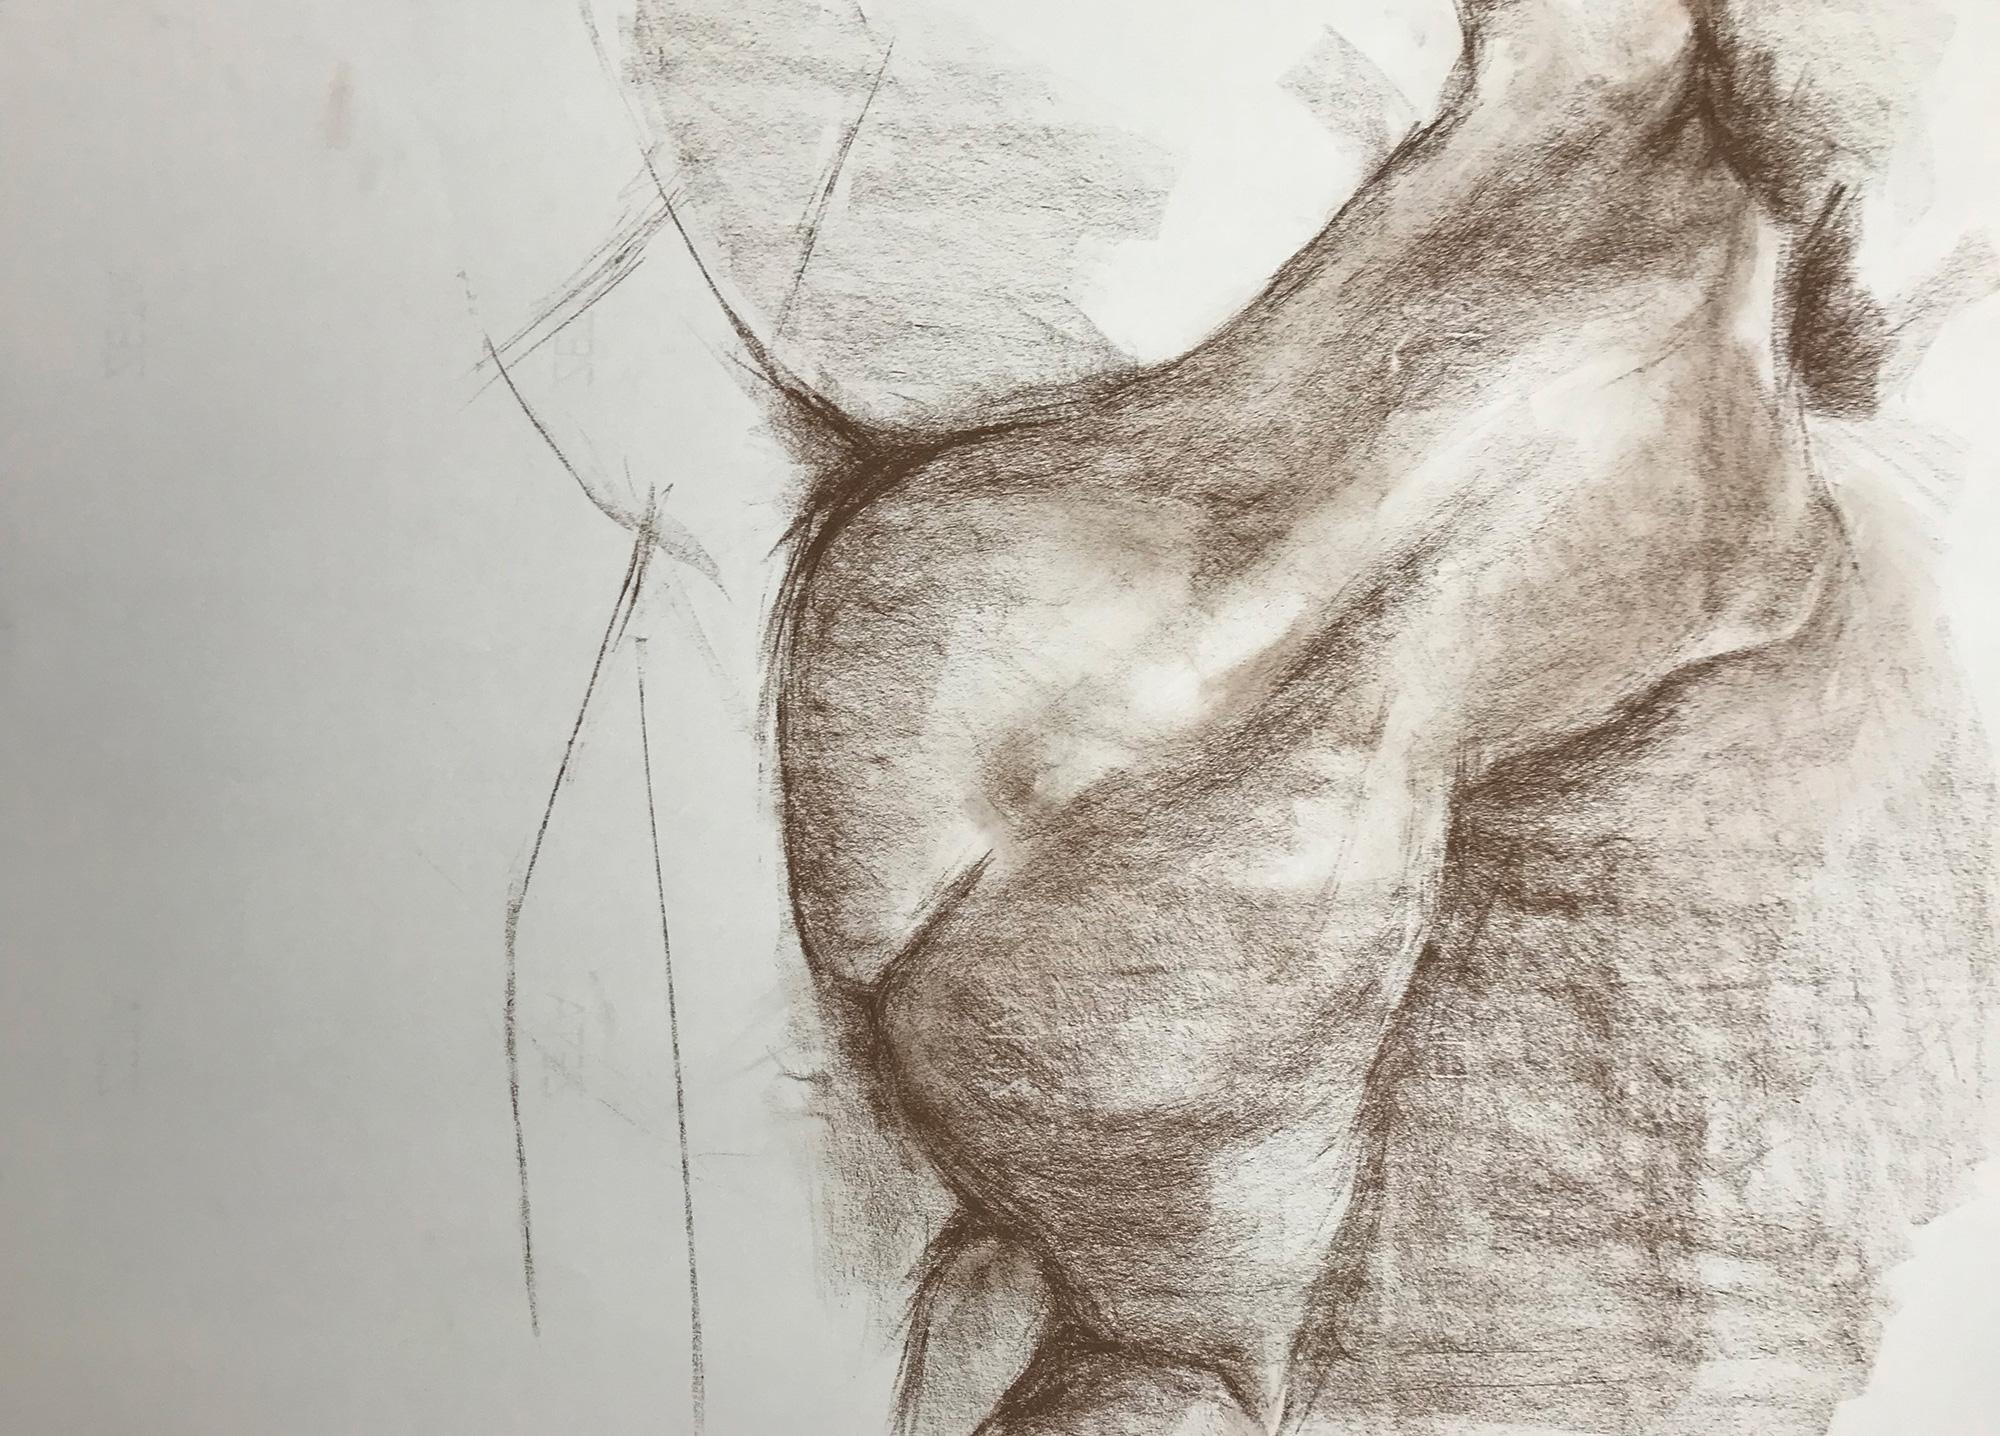 yardley-arts-life-drawing-classes.jpg